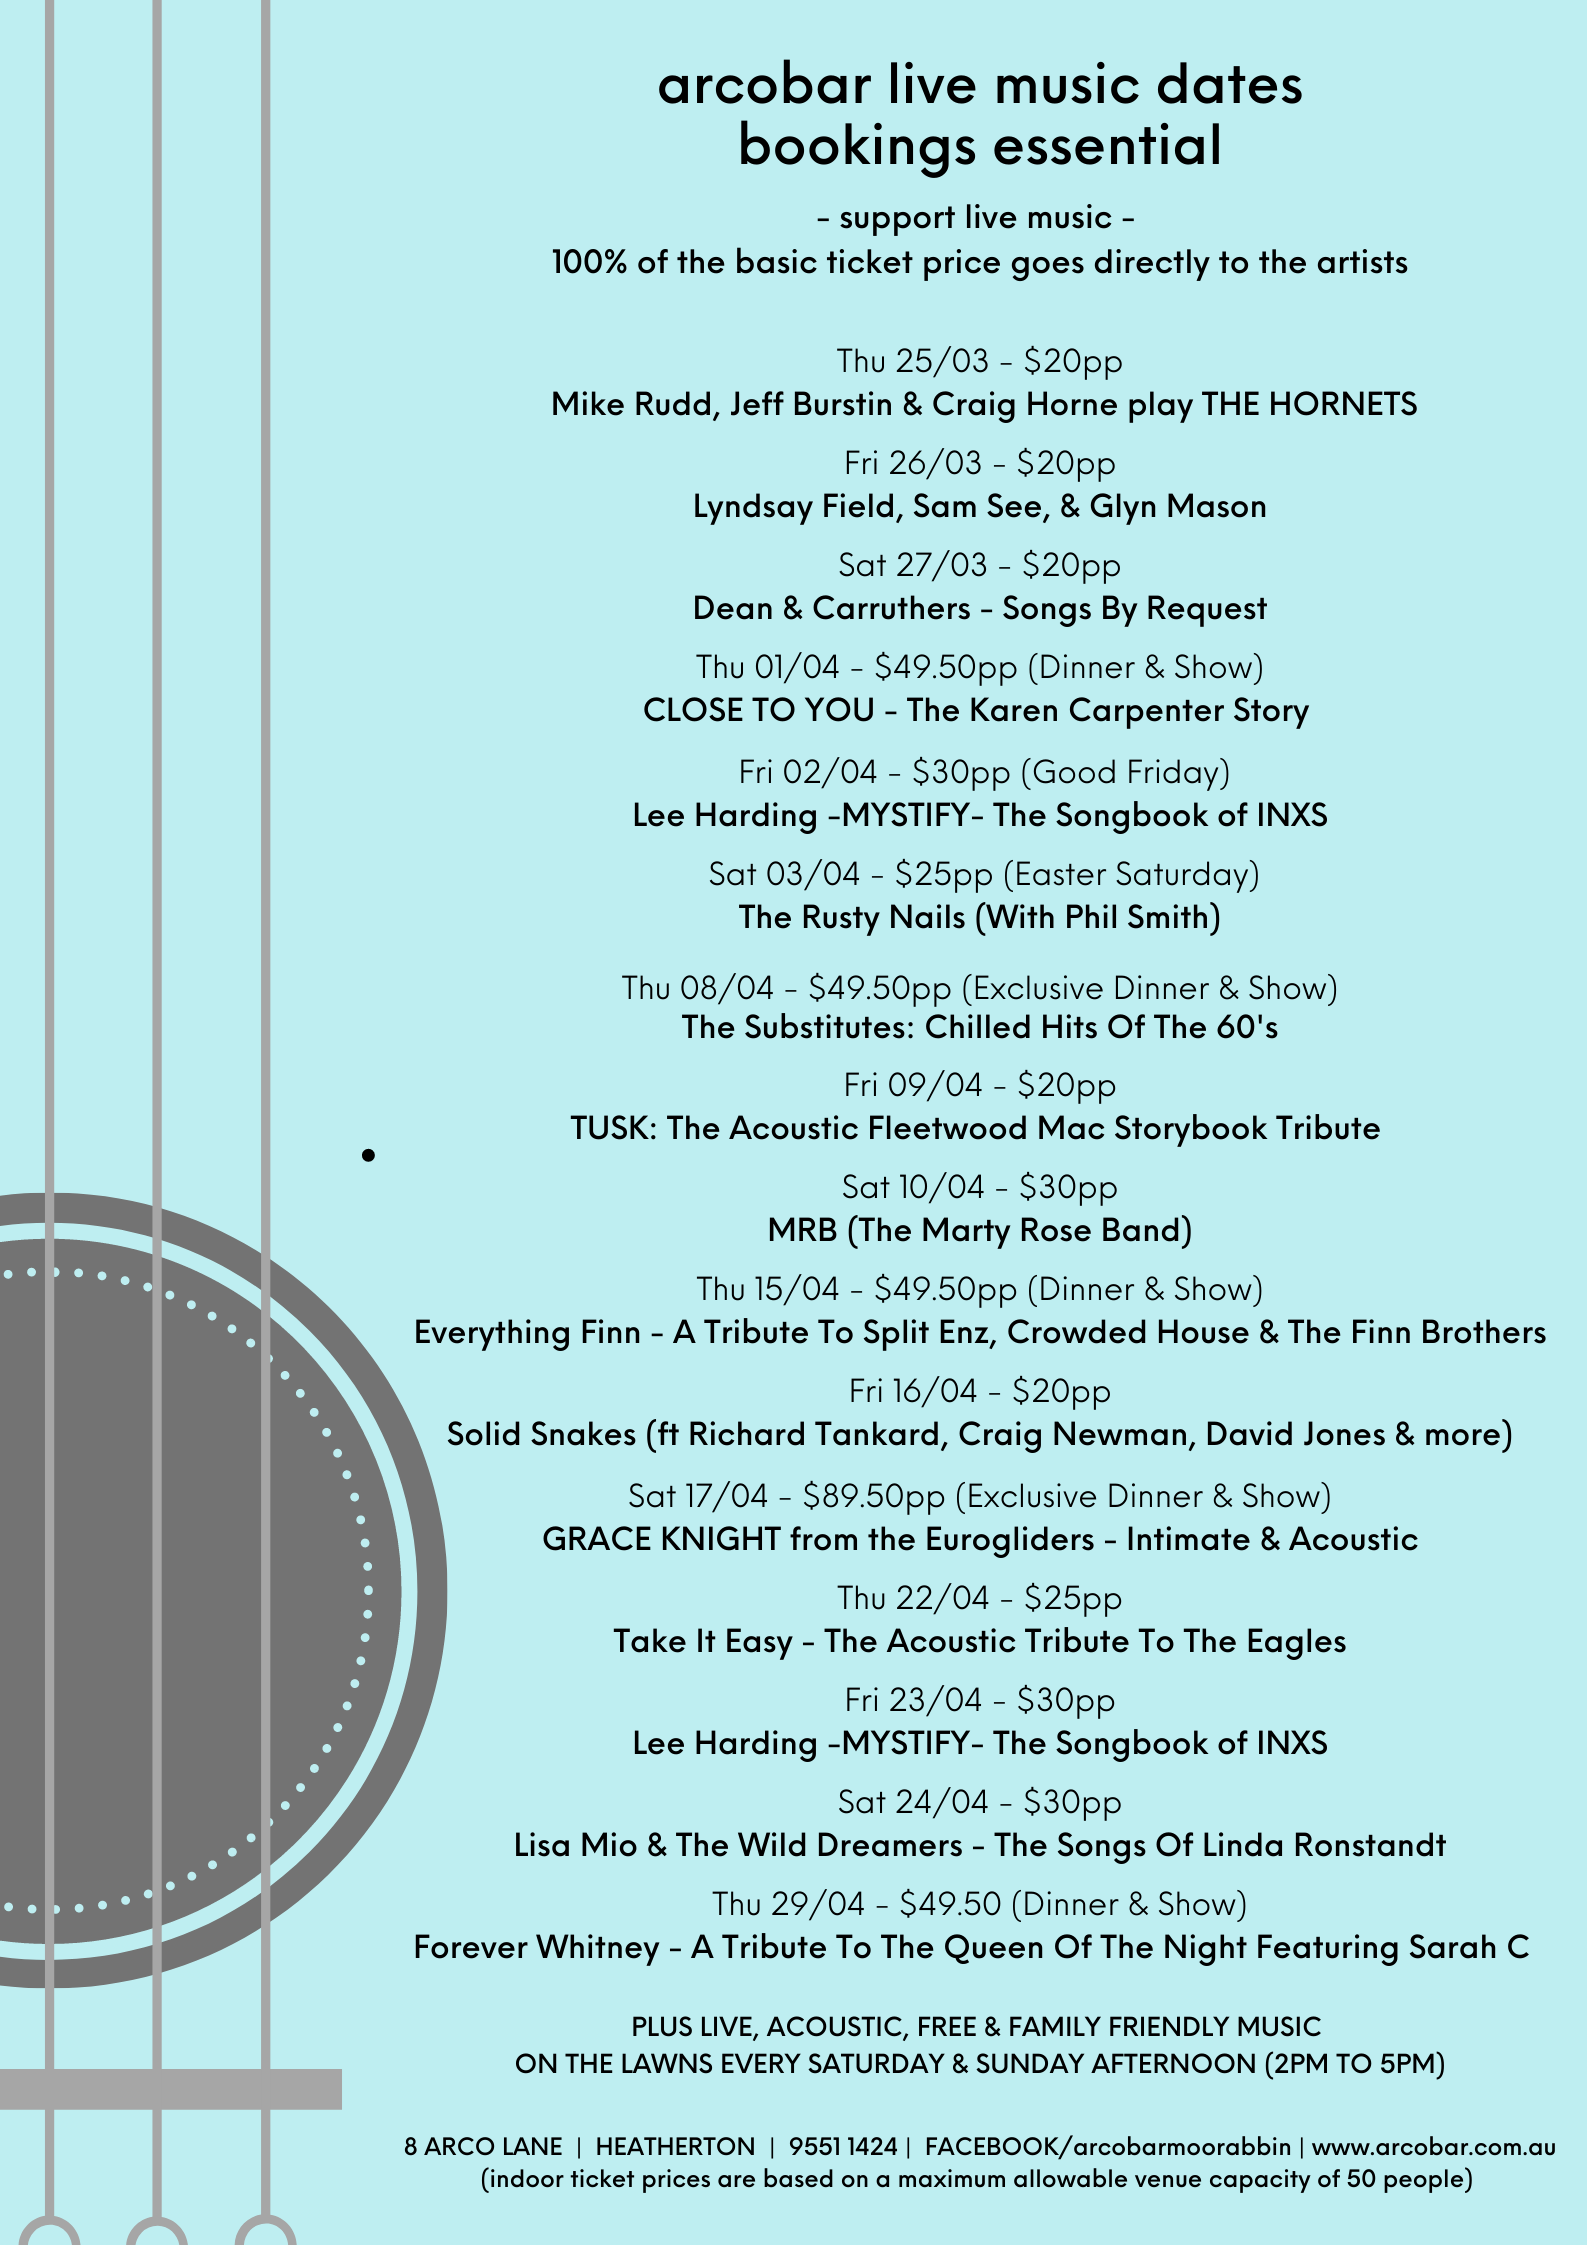 LIVE-MUSIC-DATES-14.png#asset:1700